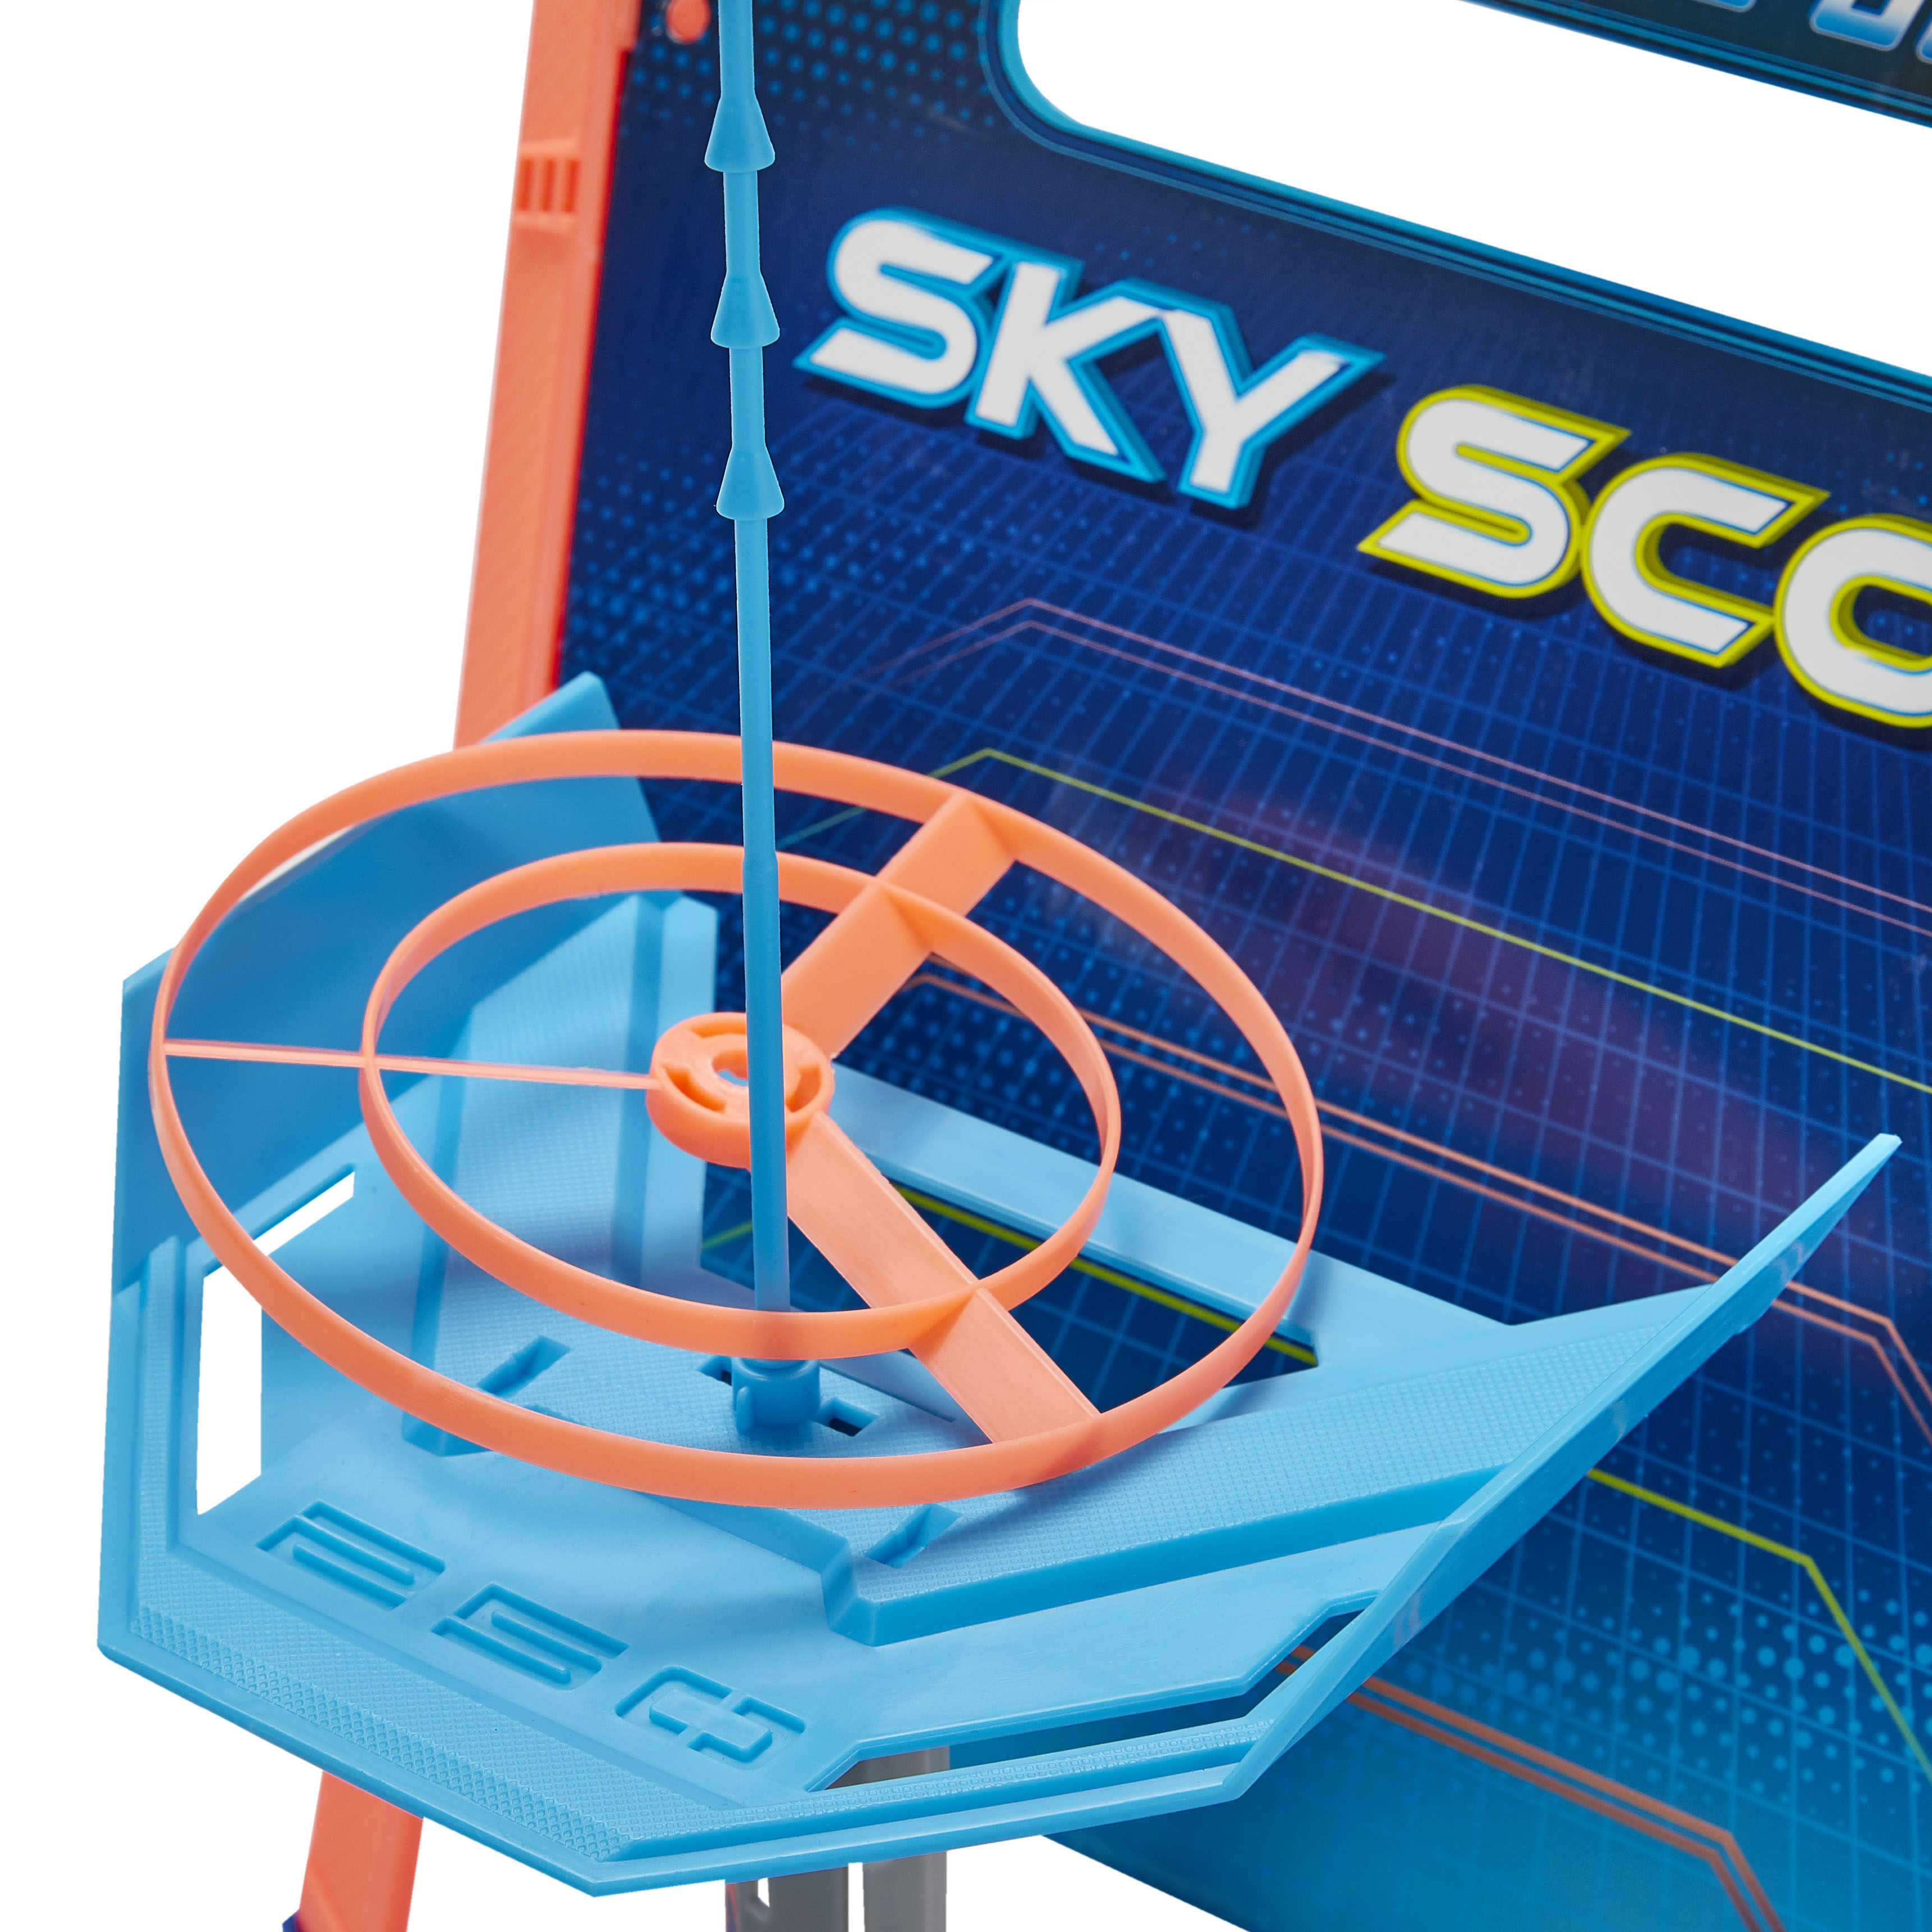 E9605 Sky Score 2